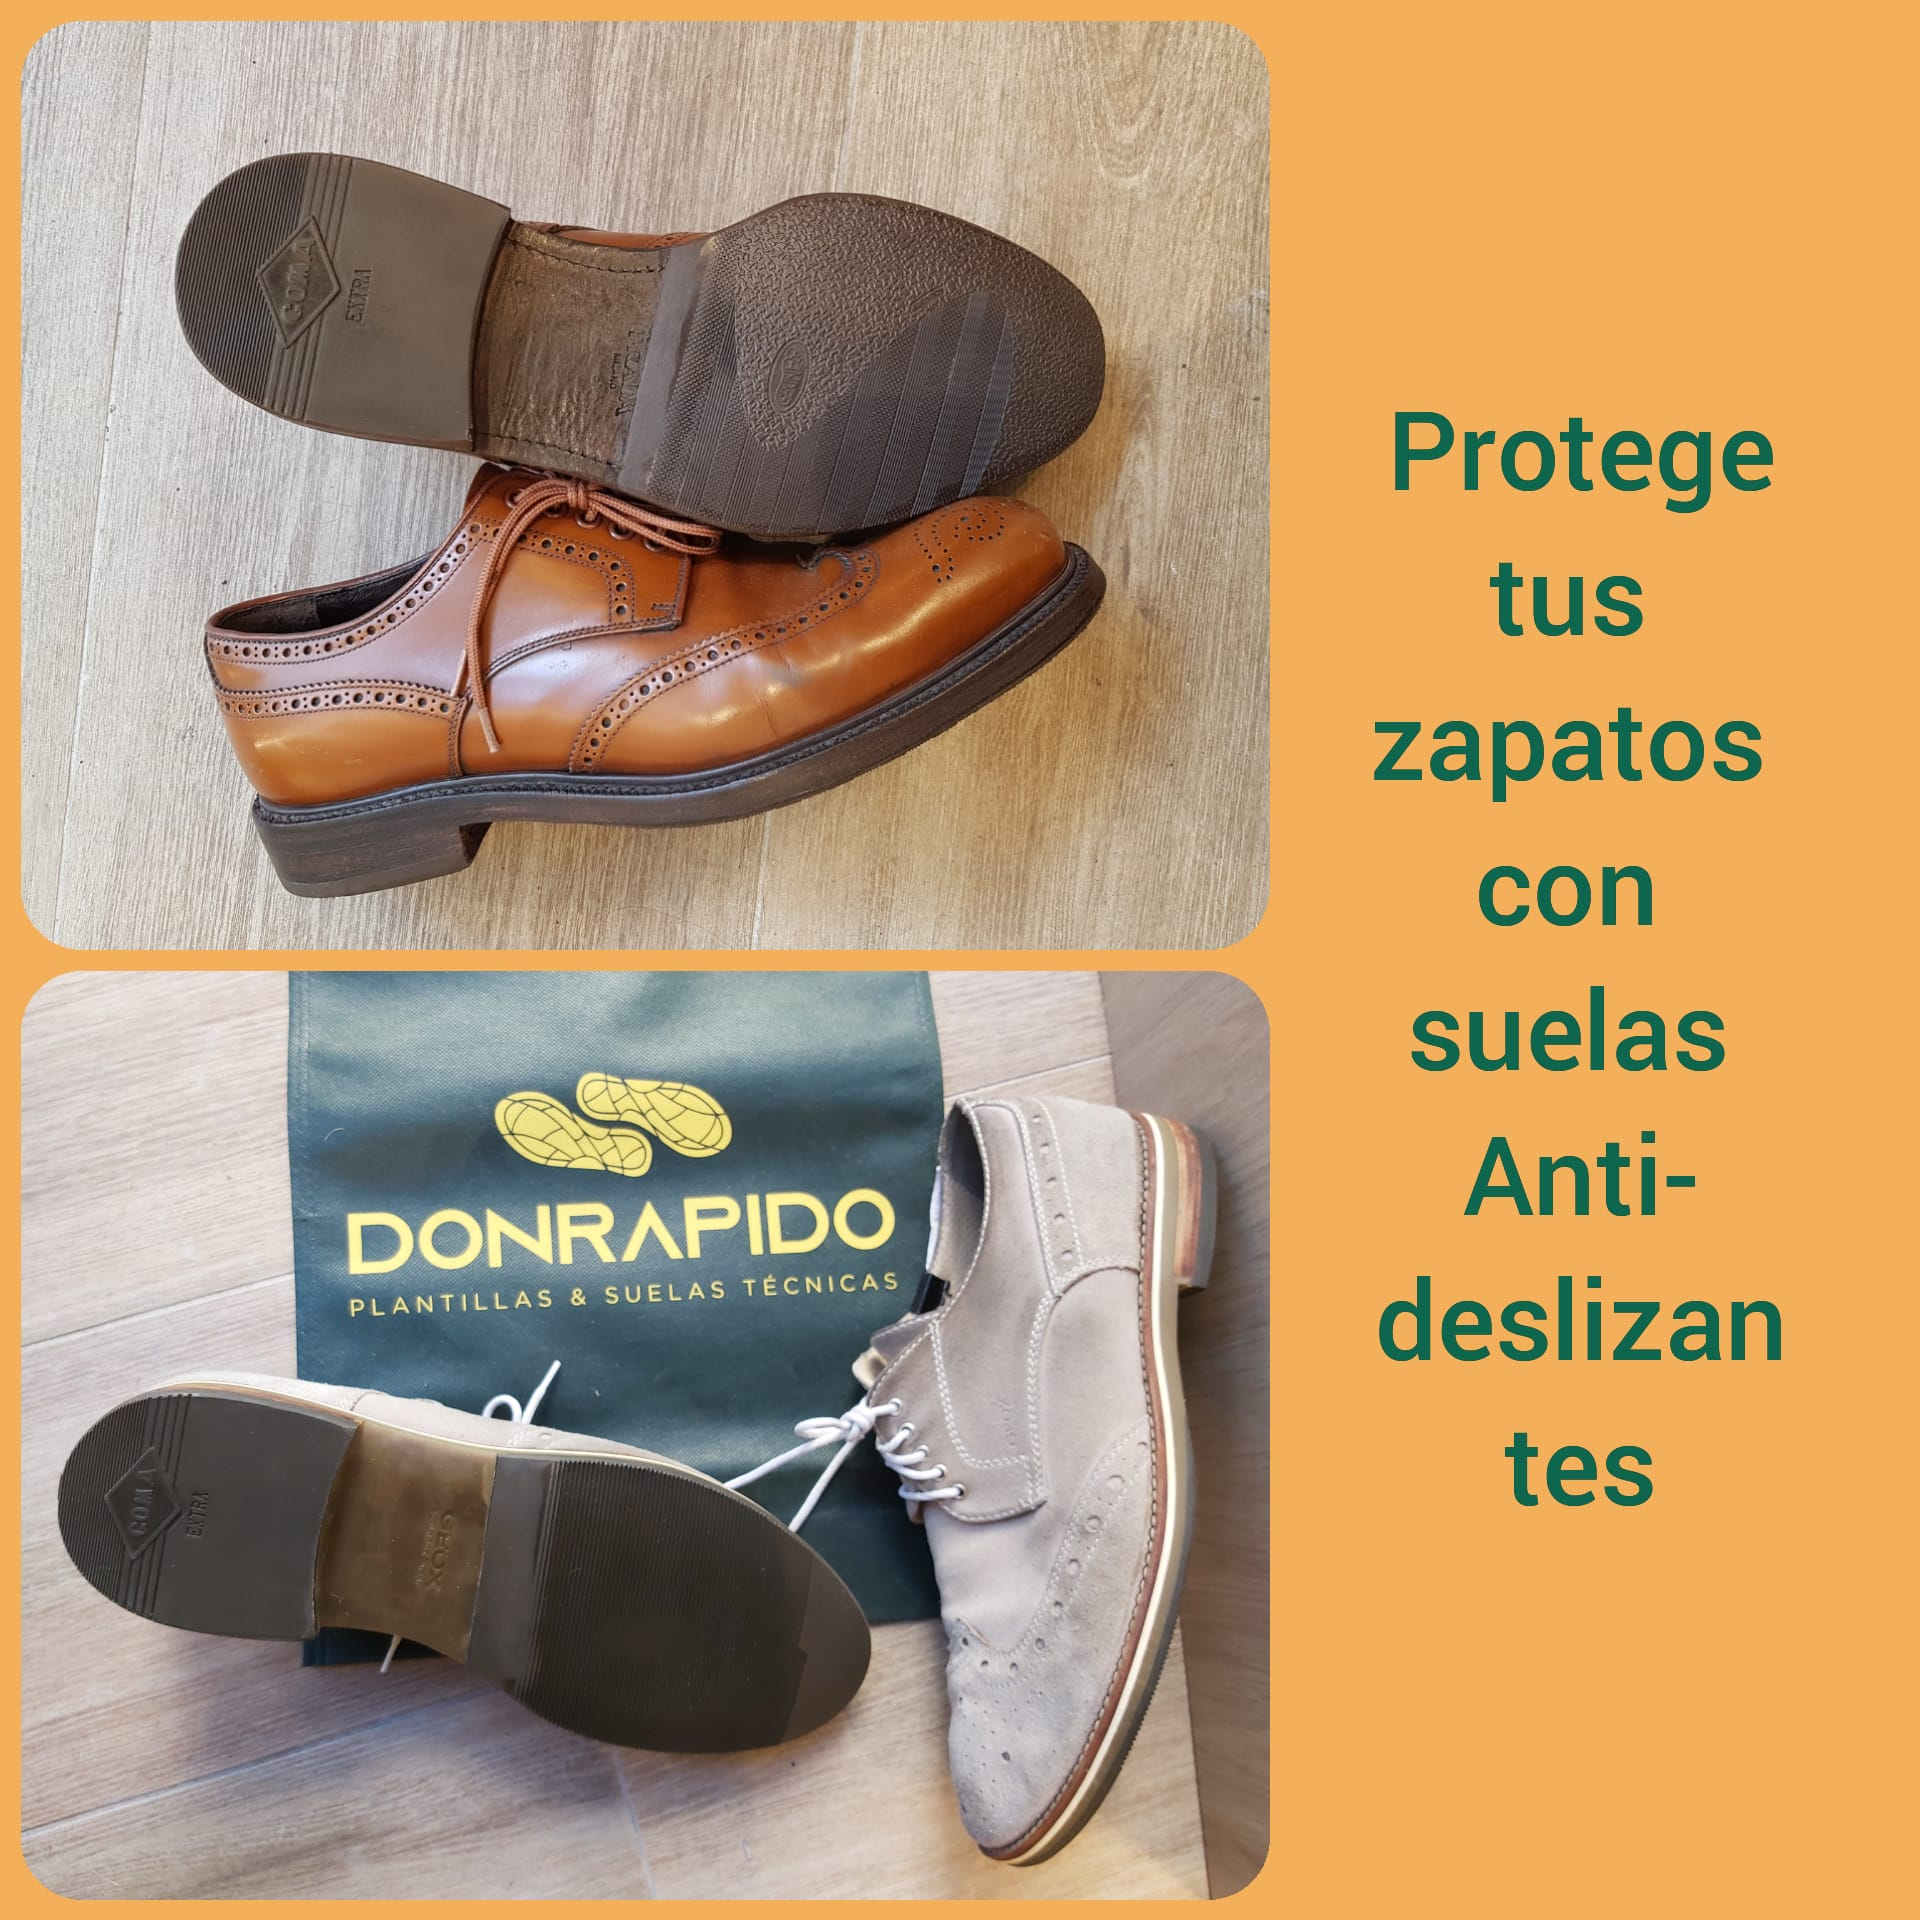 Zapatero_pamplona 2020-08-07 at 18.35.19